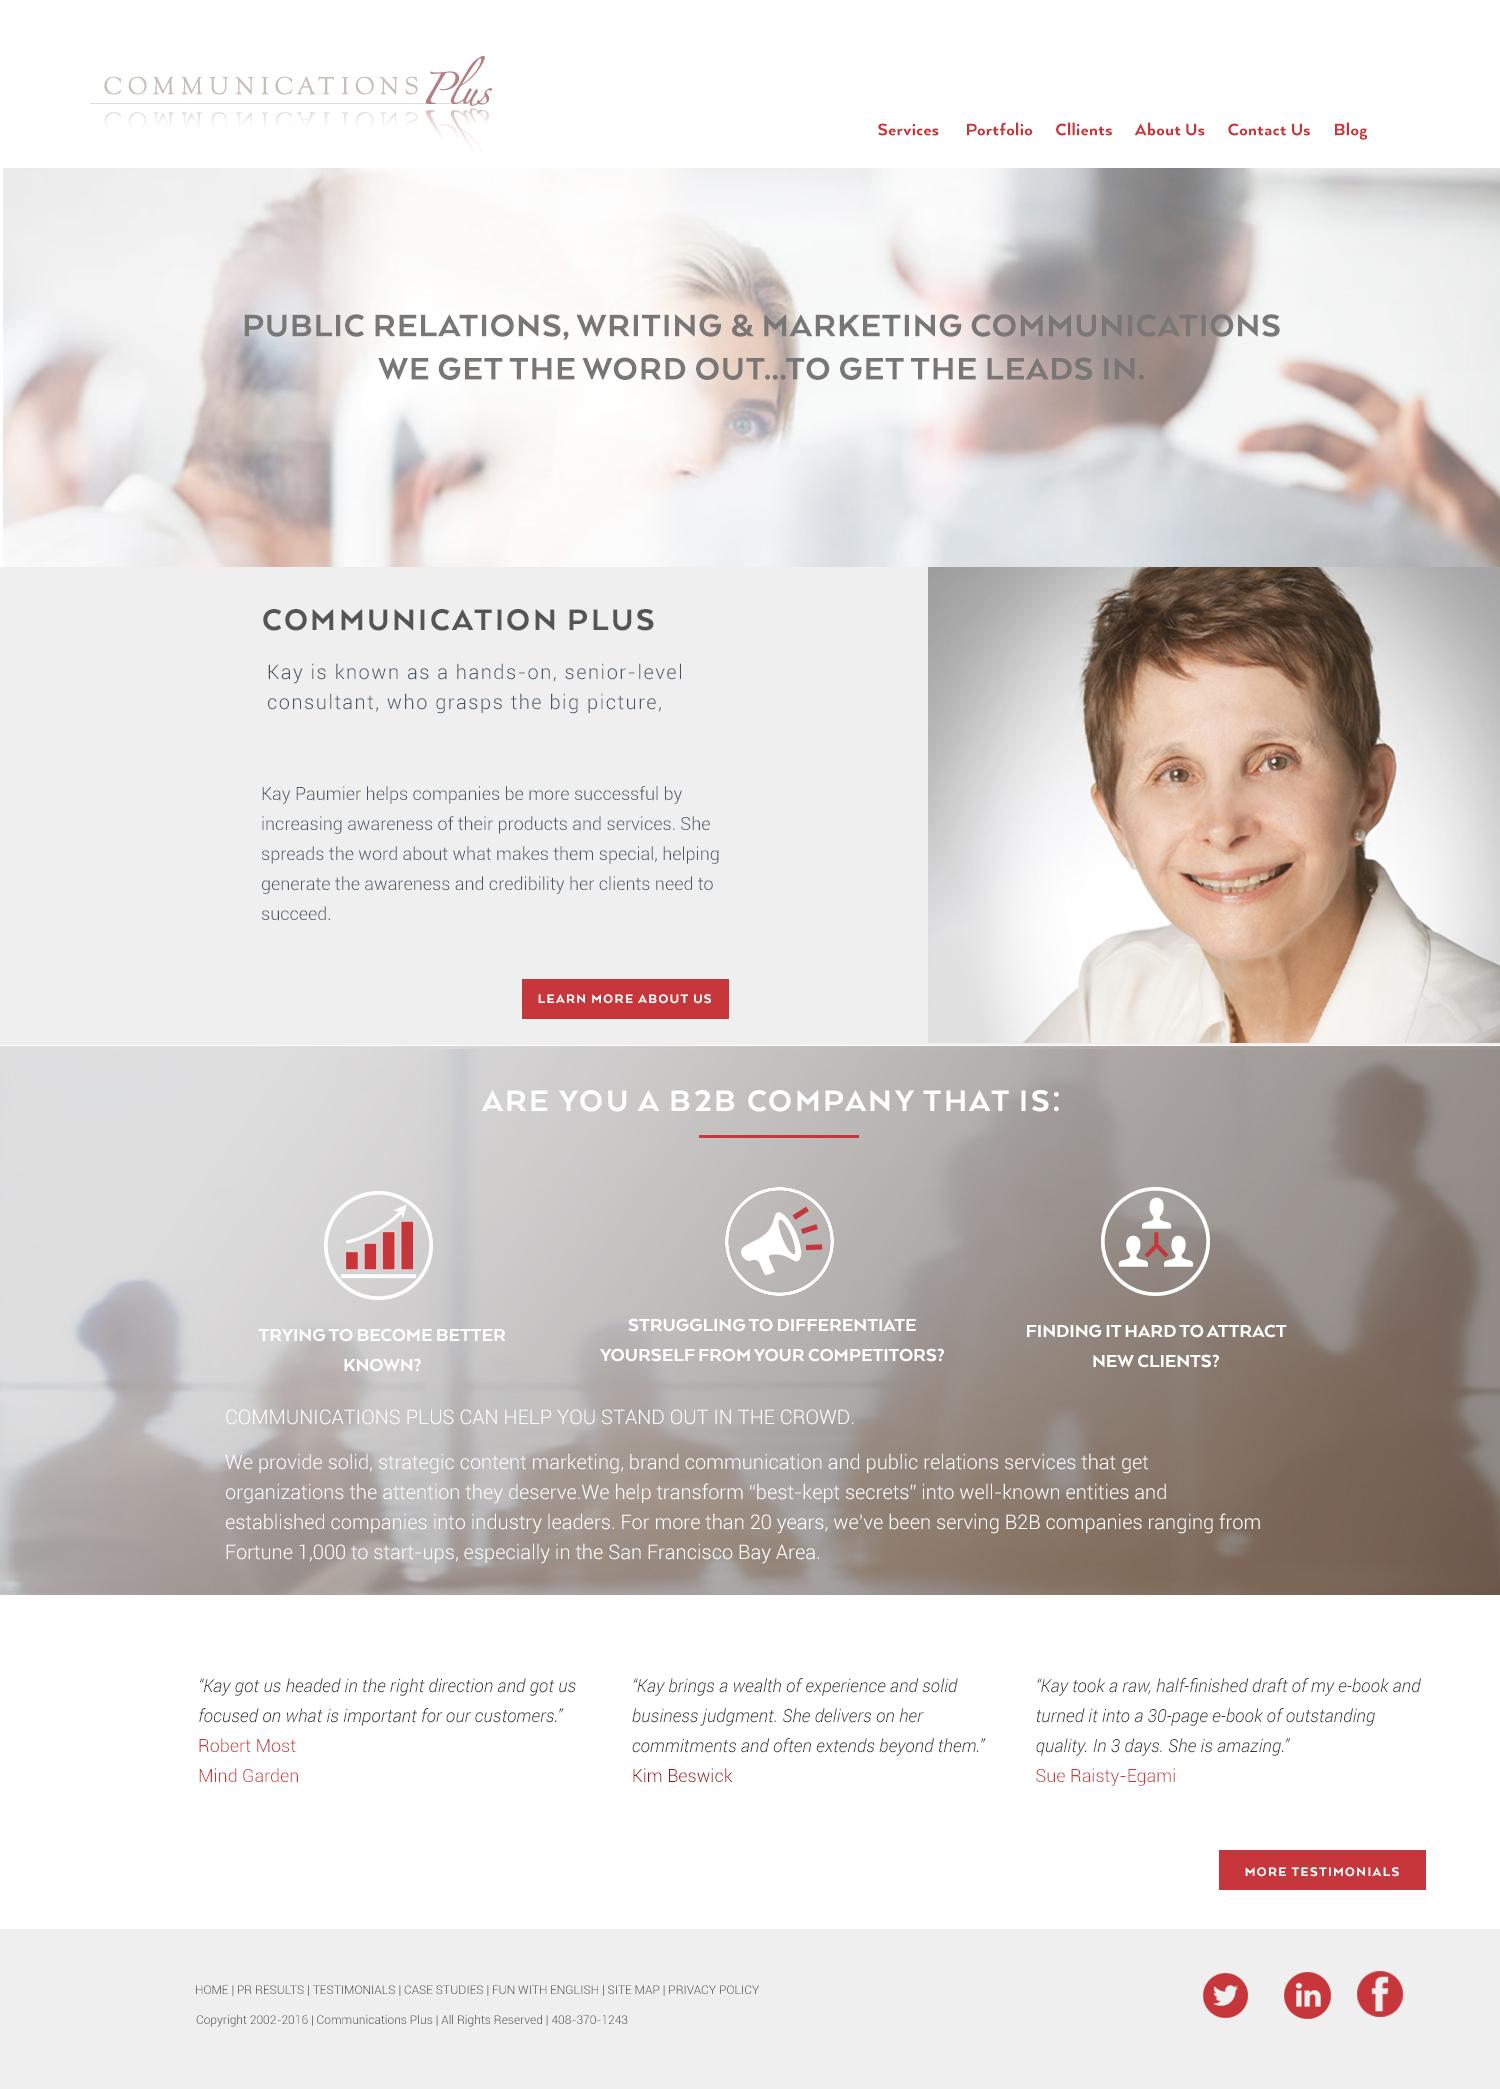 CommunicationPlus-homepage.jpg